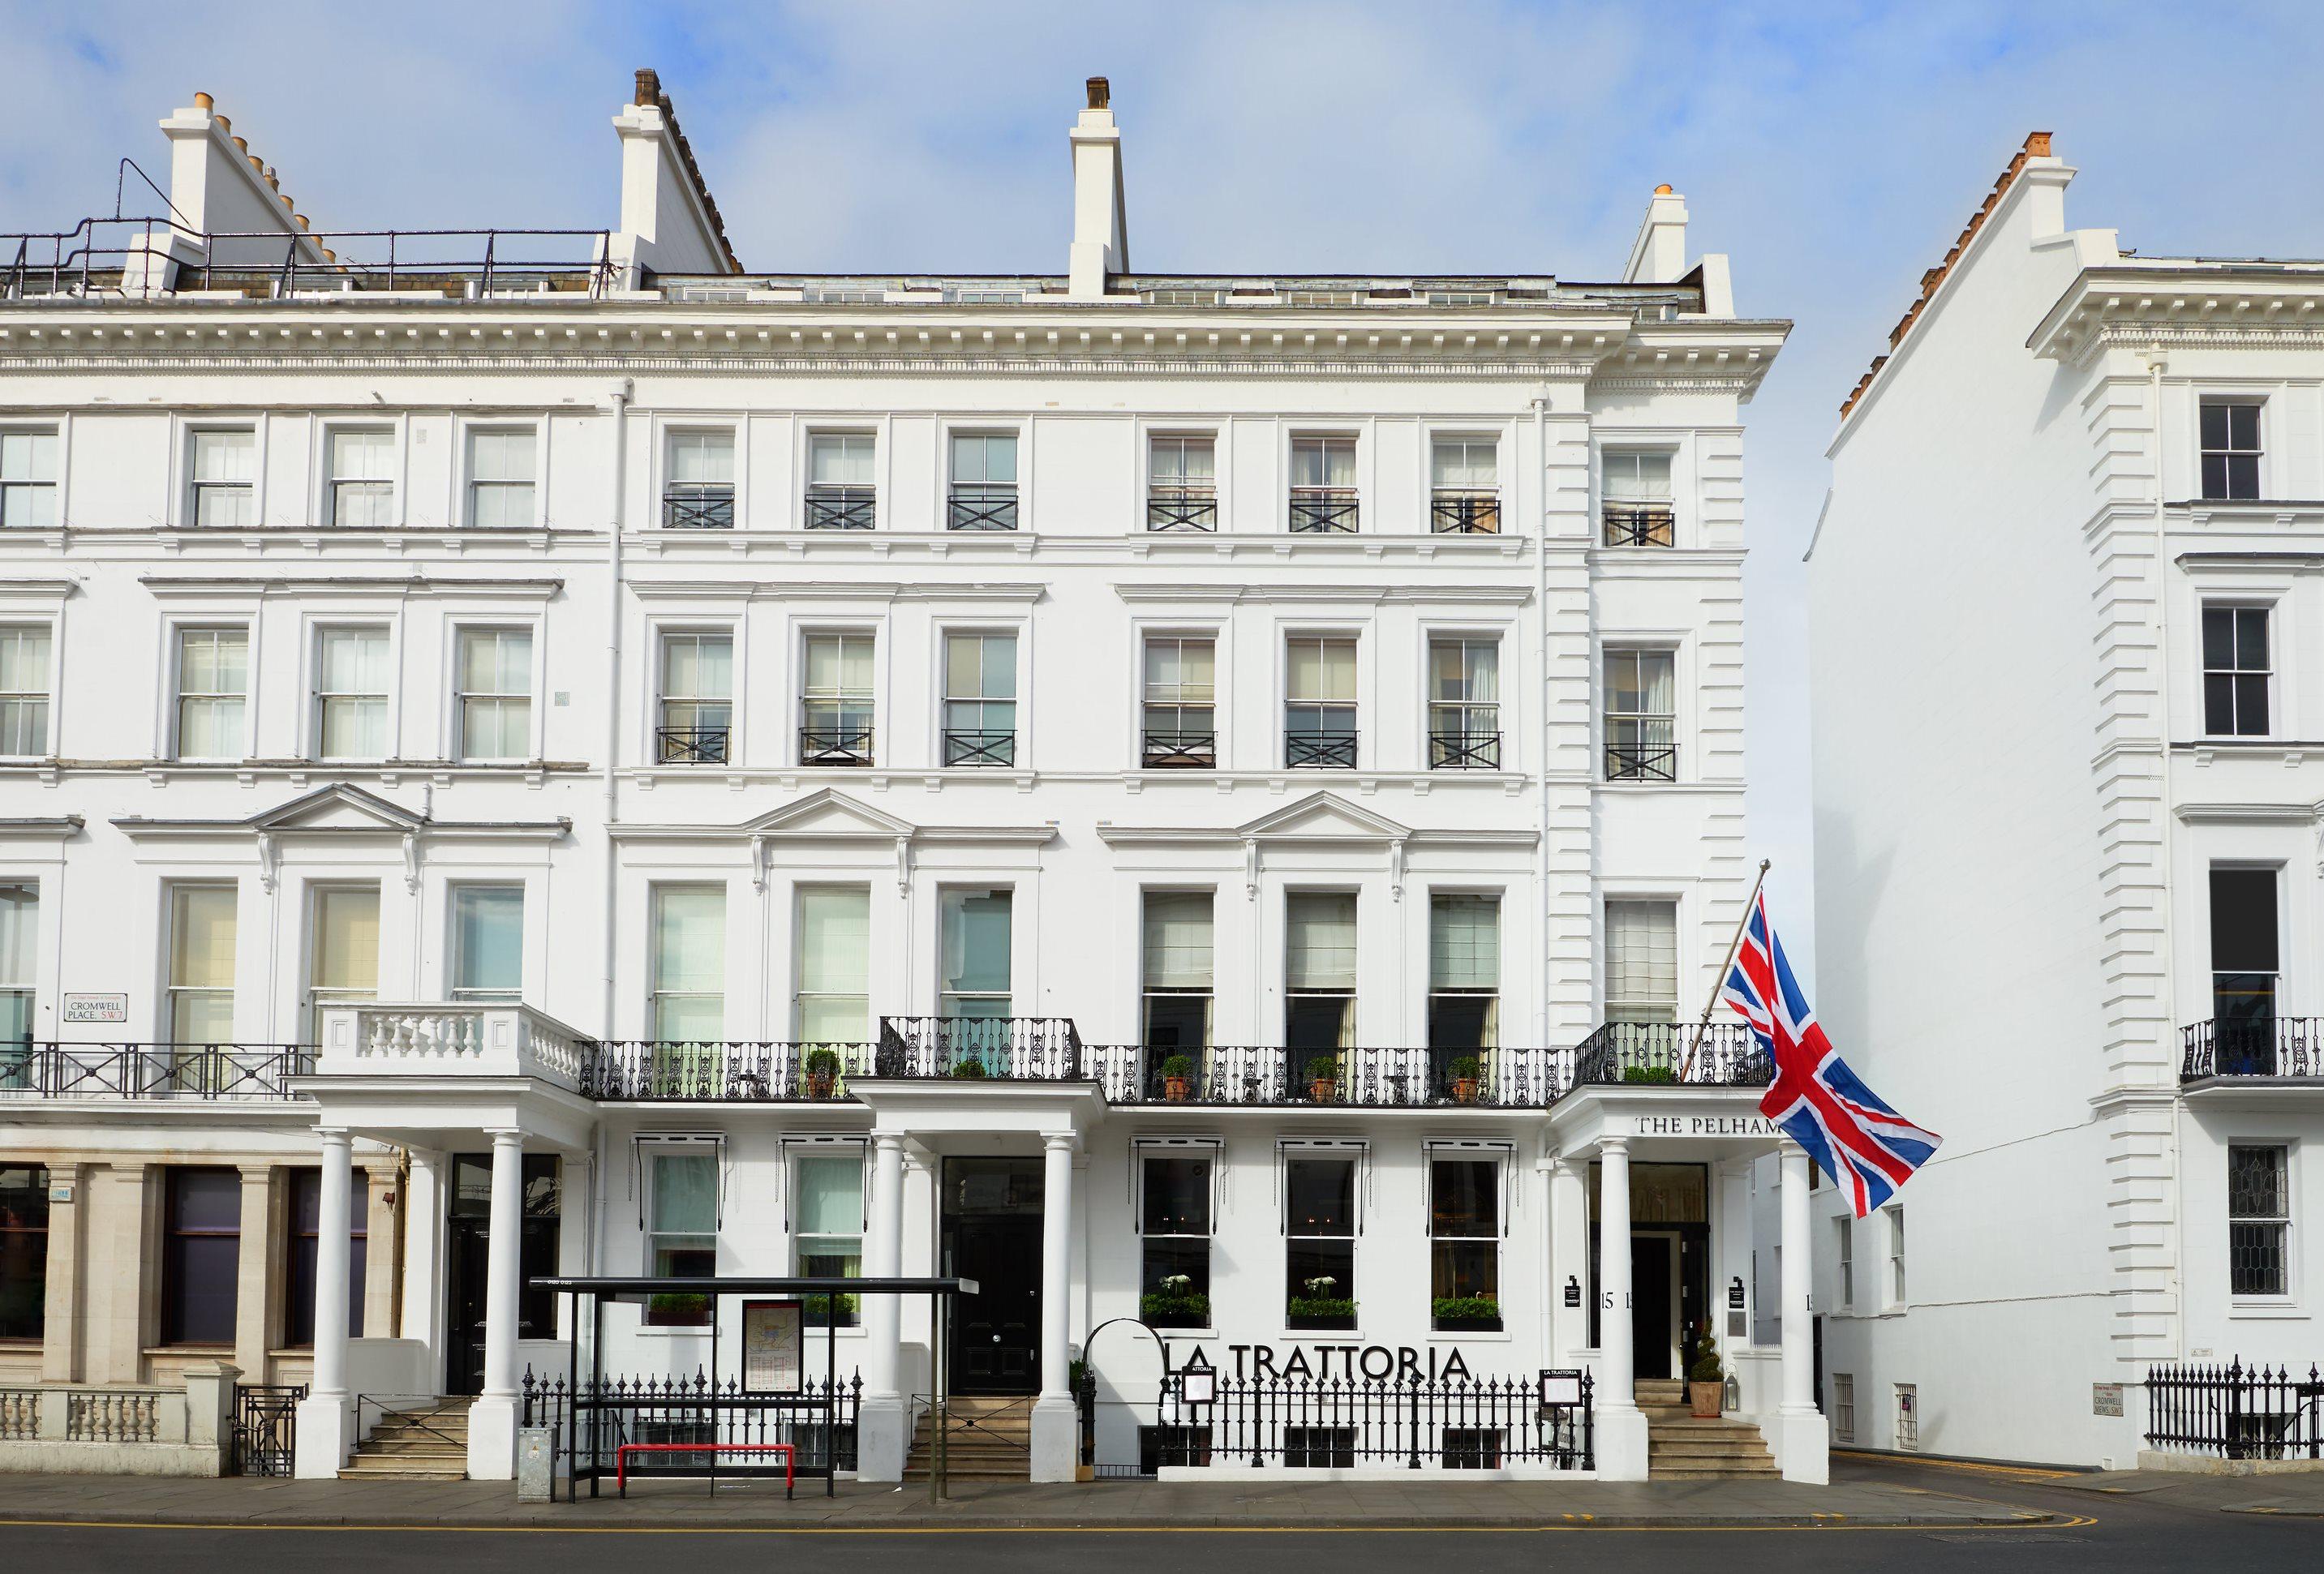 staycation at the pelham hotel london kensington mums. Black Bedroom Furniture Sets. Home Design Ideas